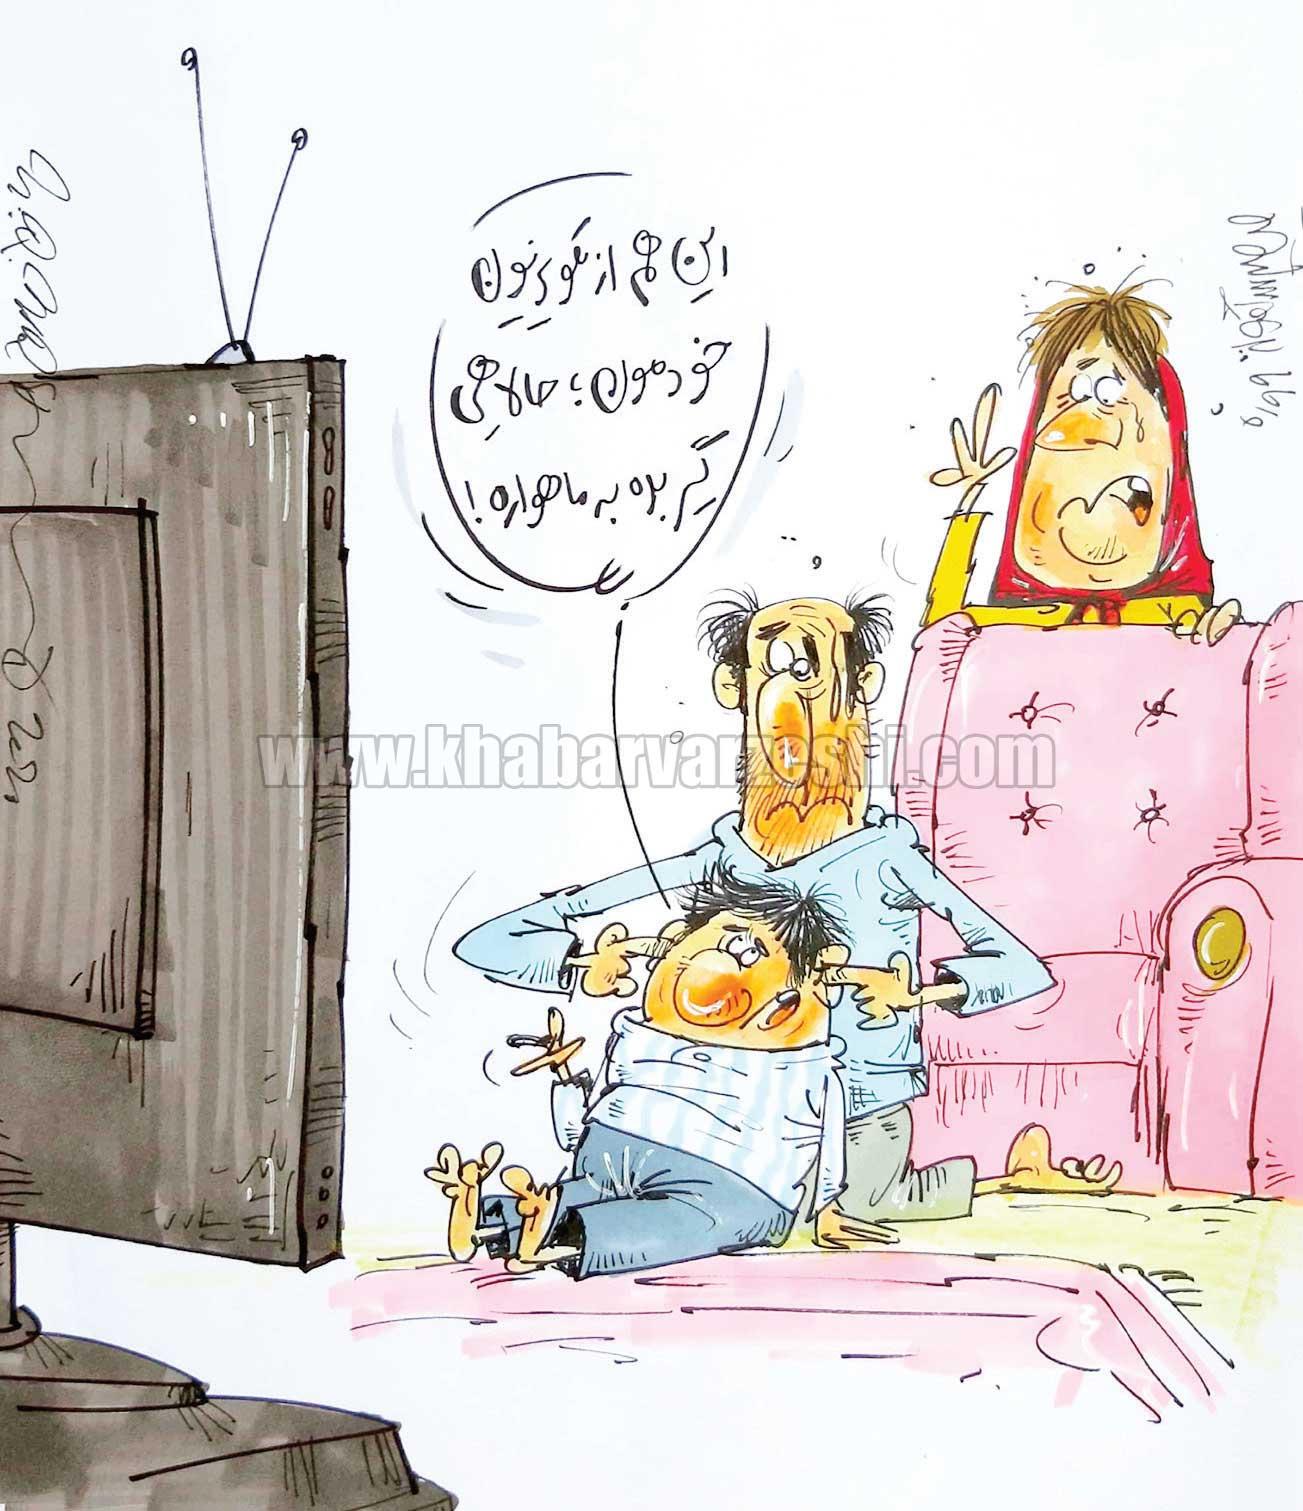 کارتون| دیگه تلویزیون خودمون هم خطرناکه!